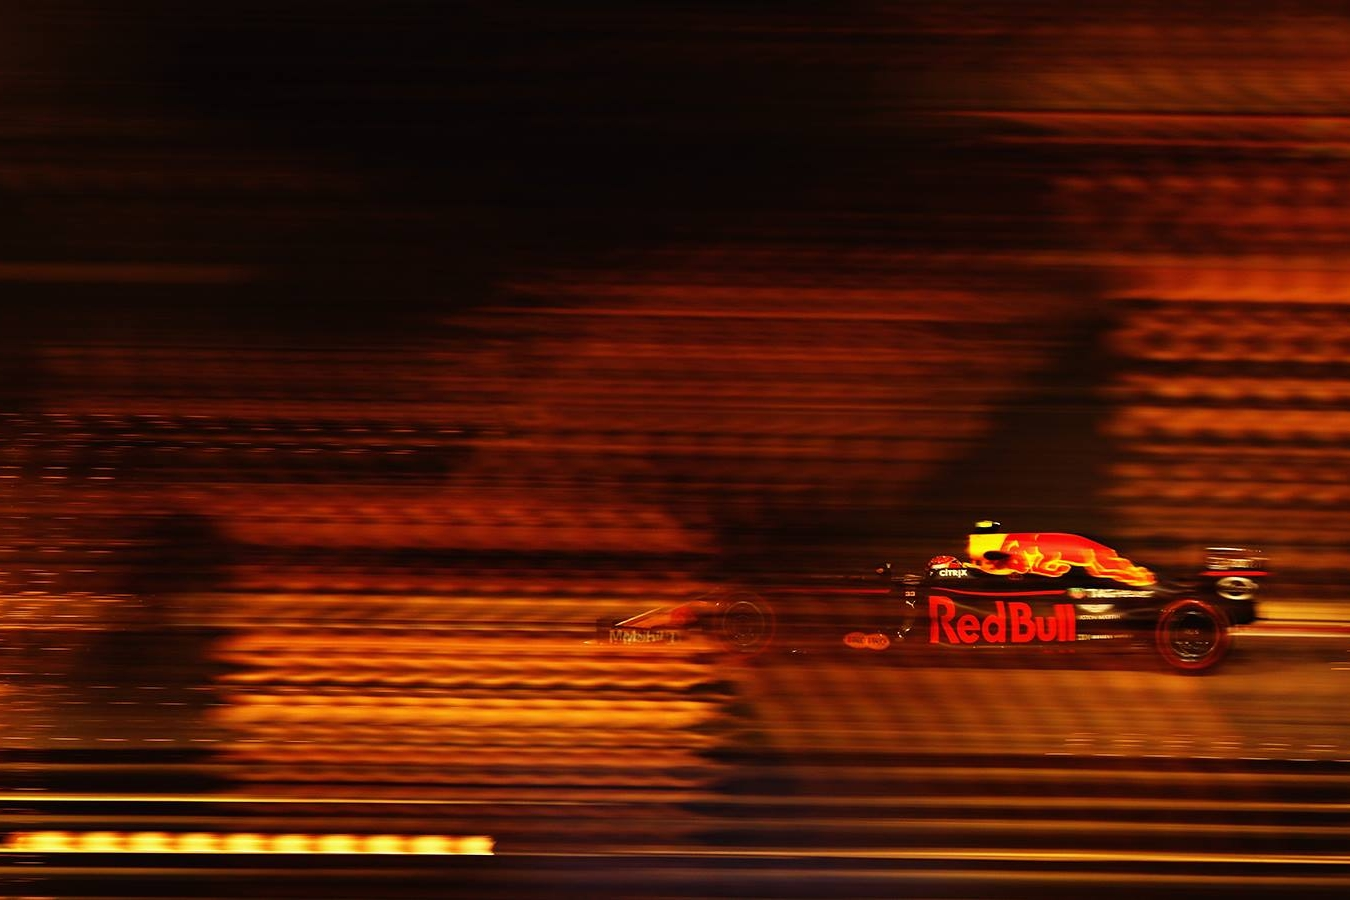 © Red Bull - Verstappen n'aura pas vu le drapeau à damiers à Sakhir